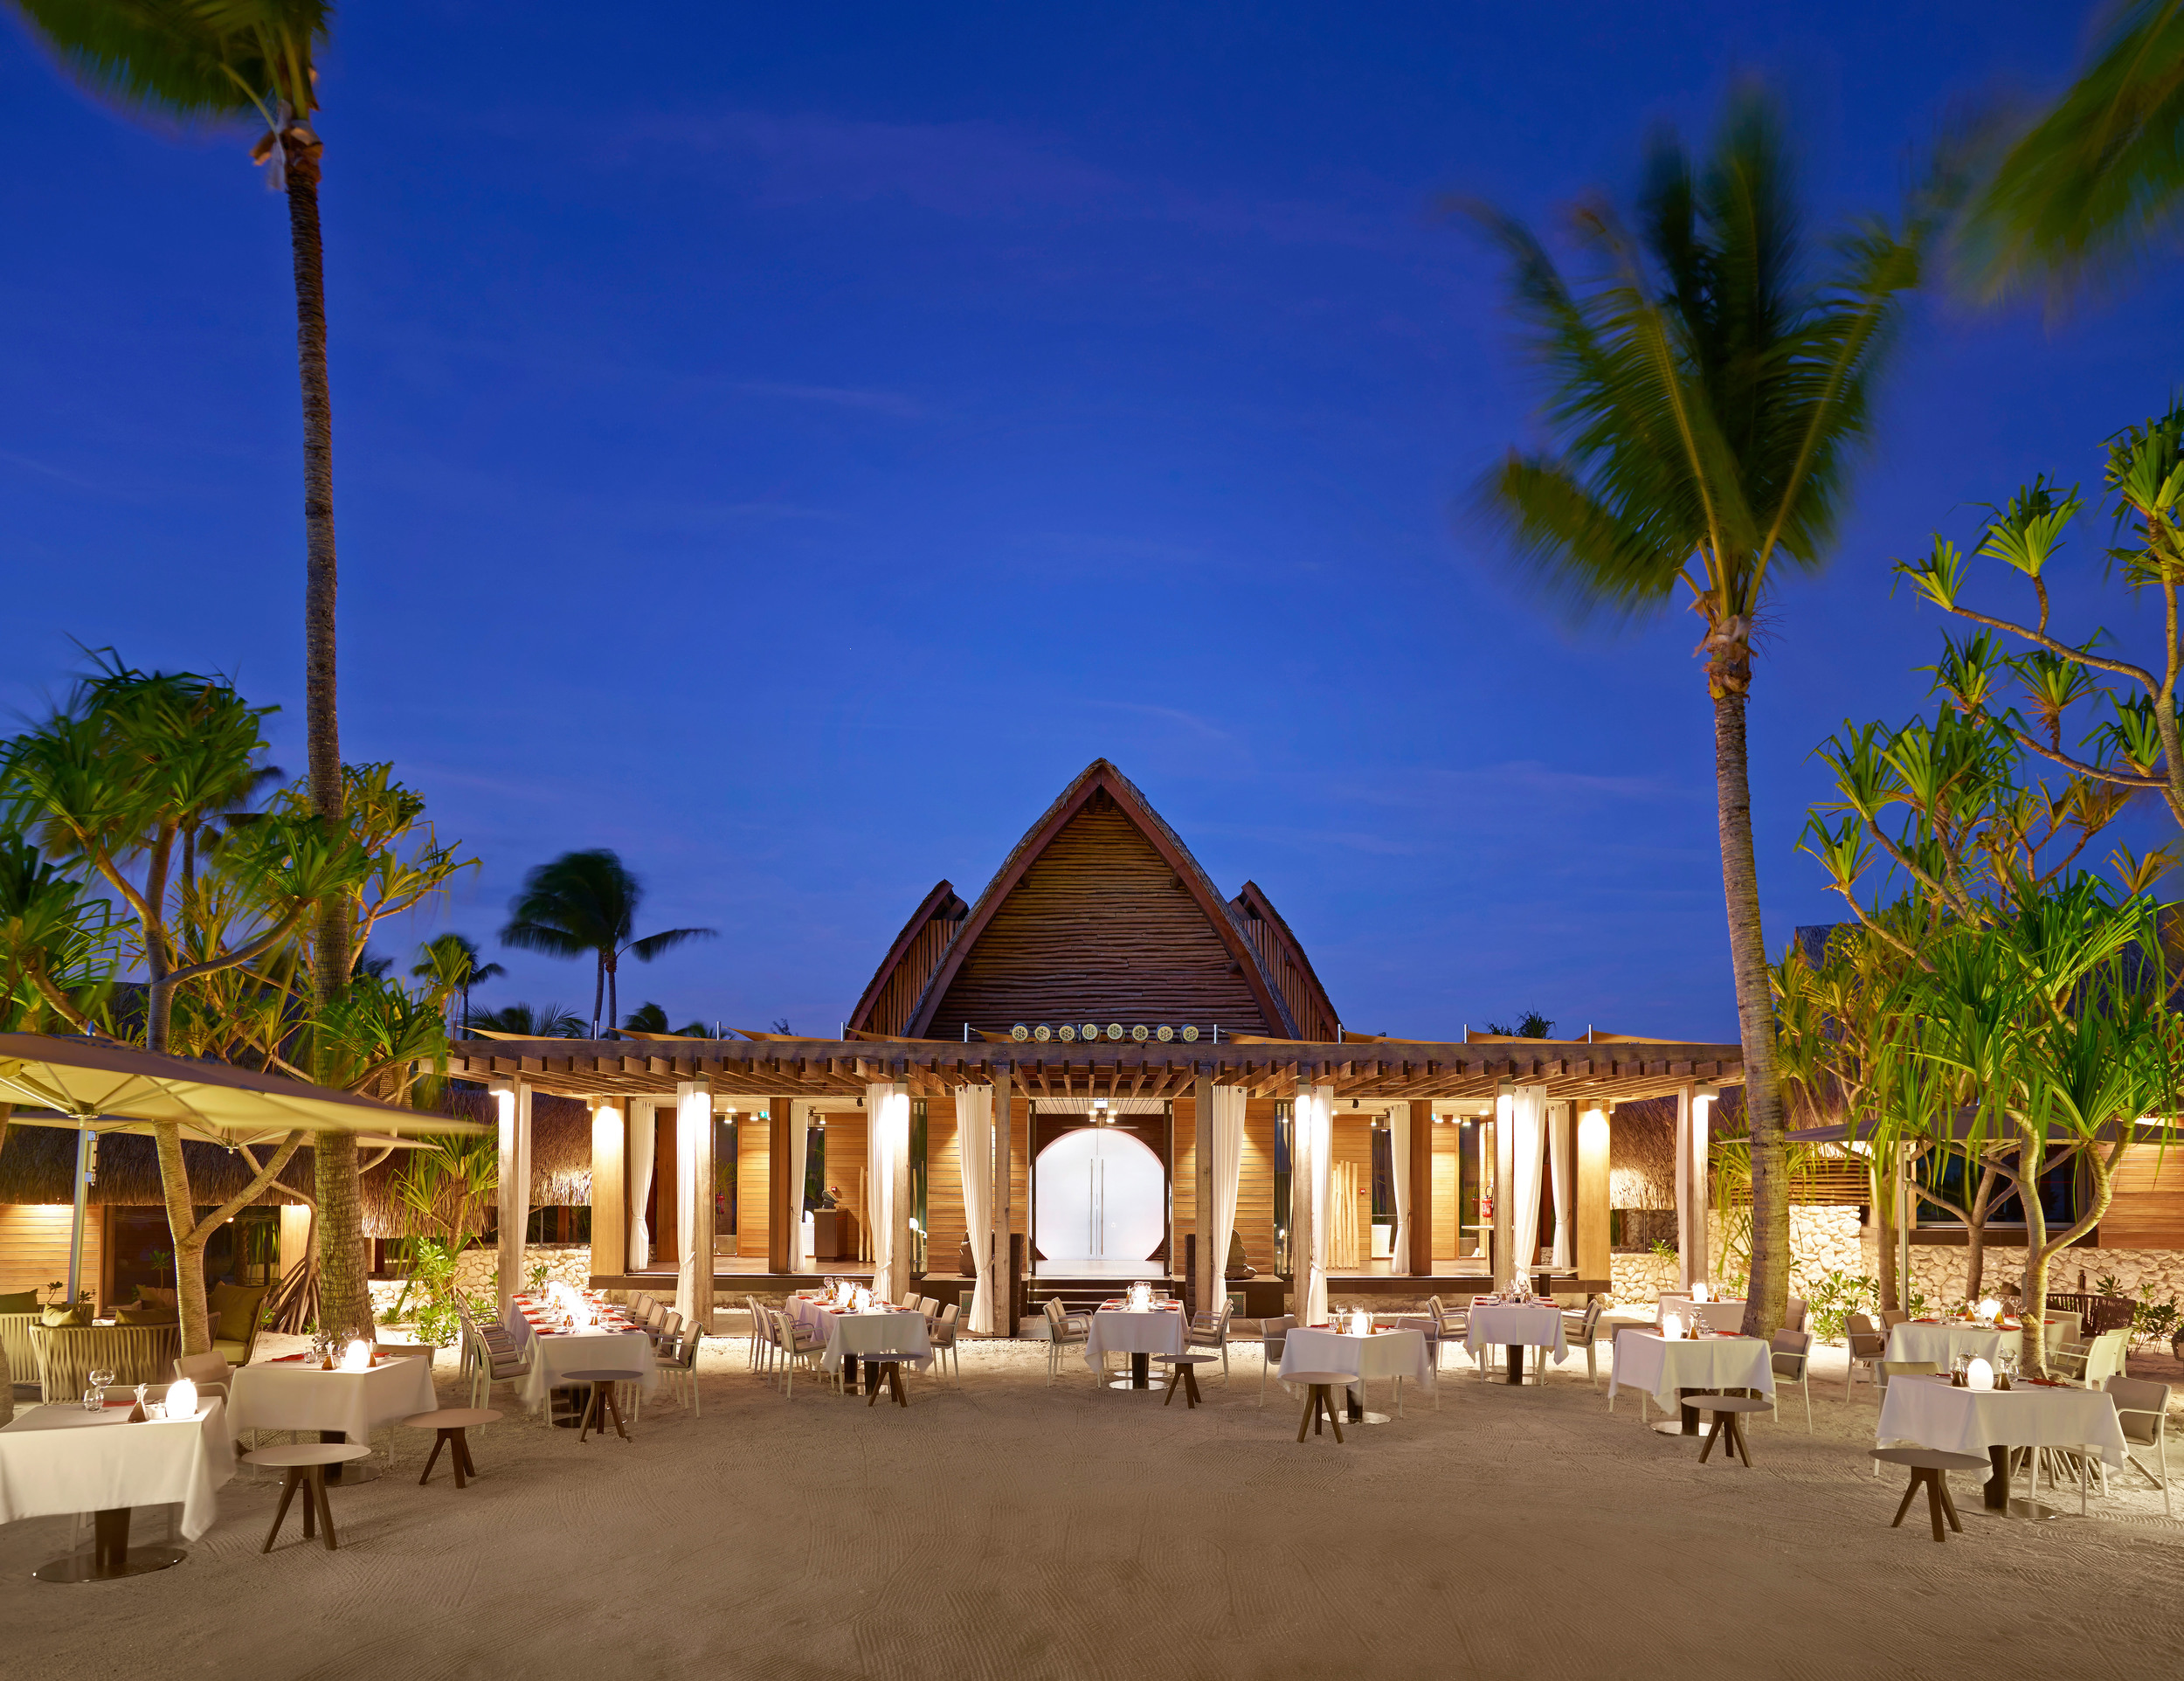 BRANDO_Restaurant-BeachDining-twilight 1sm.jpg